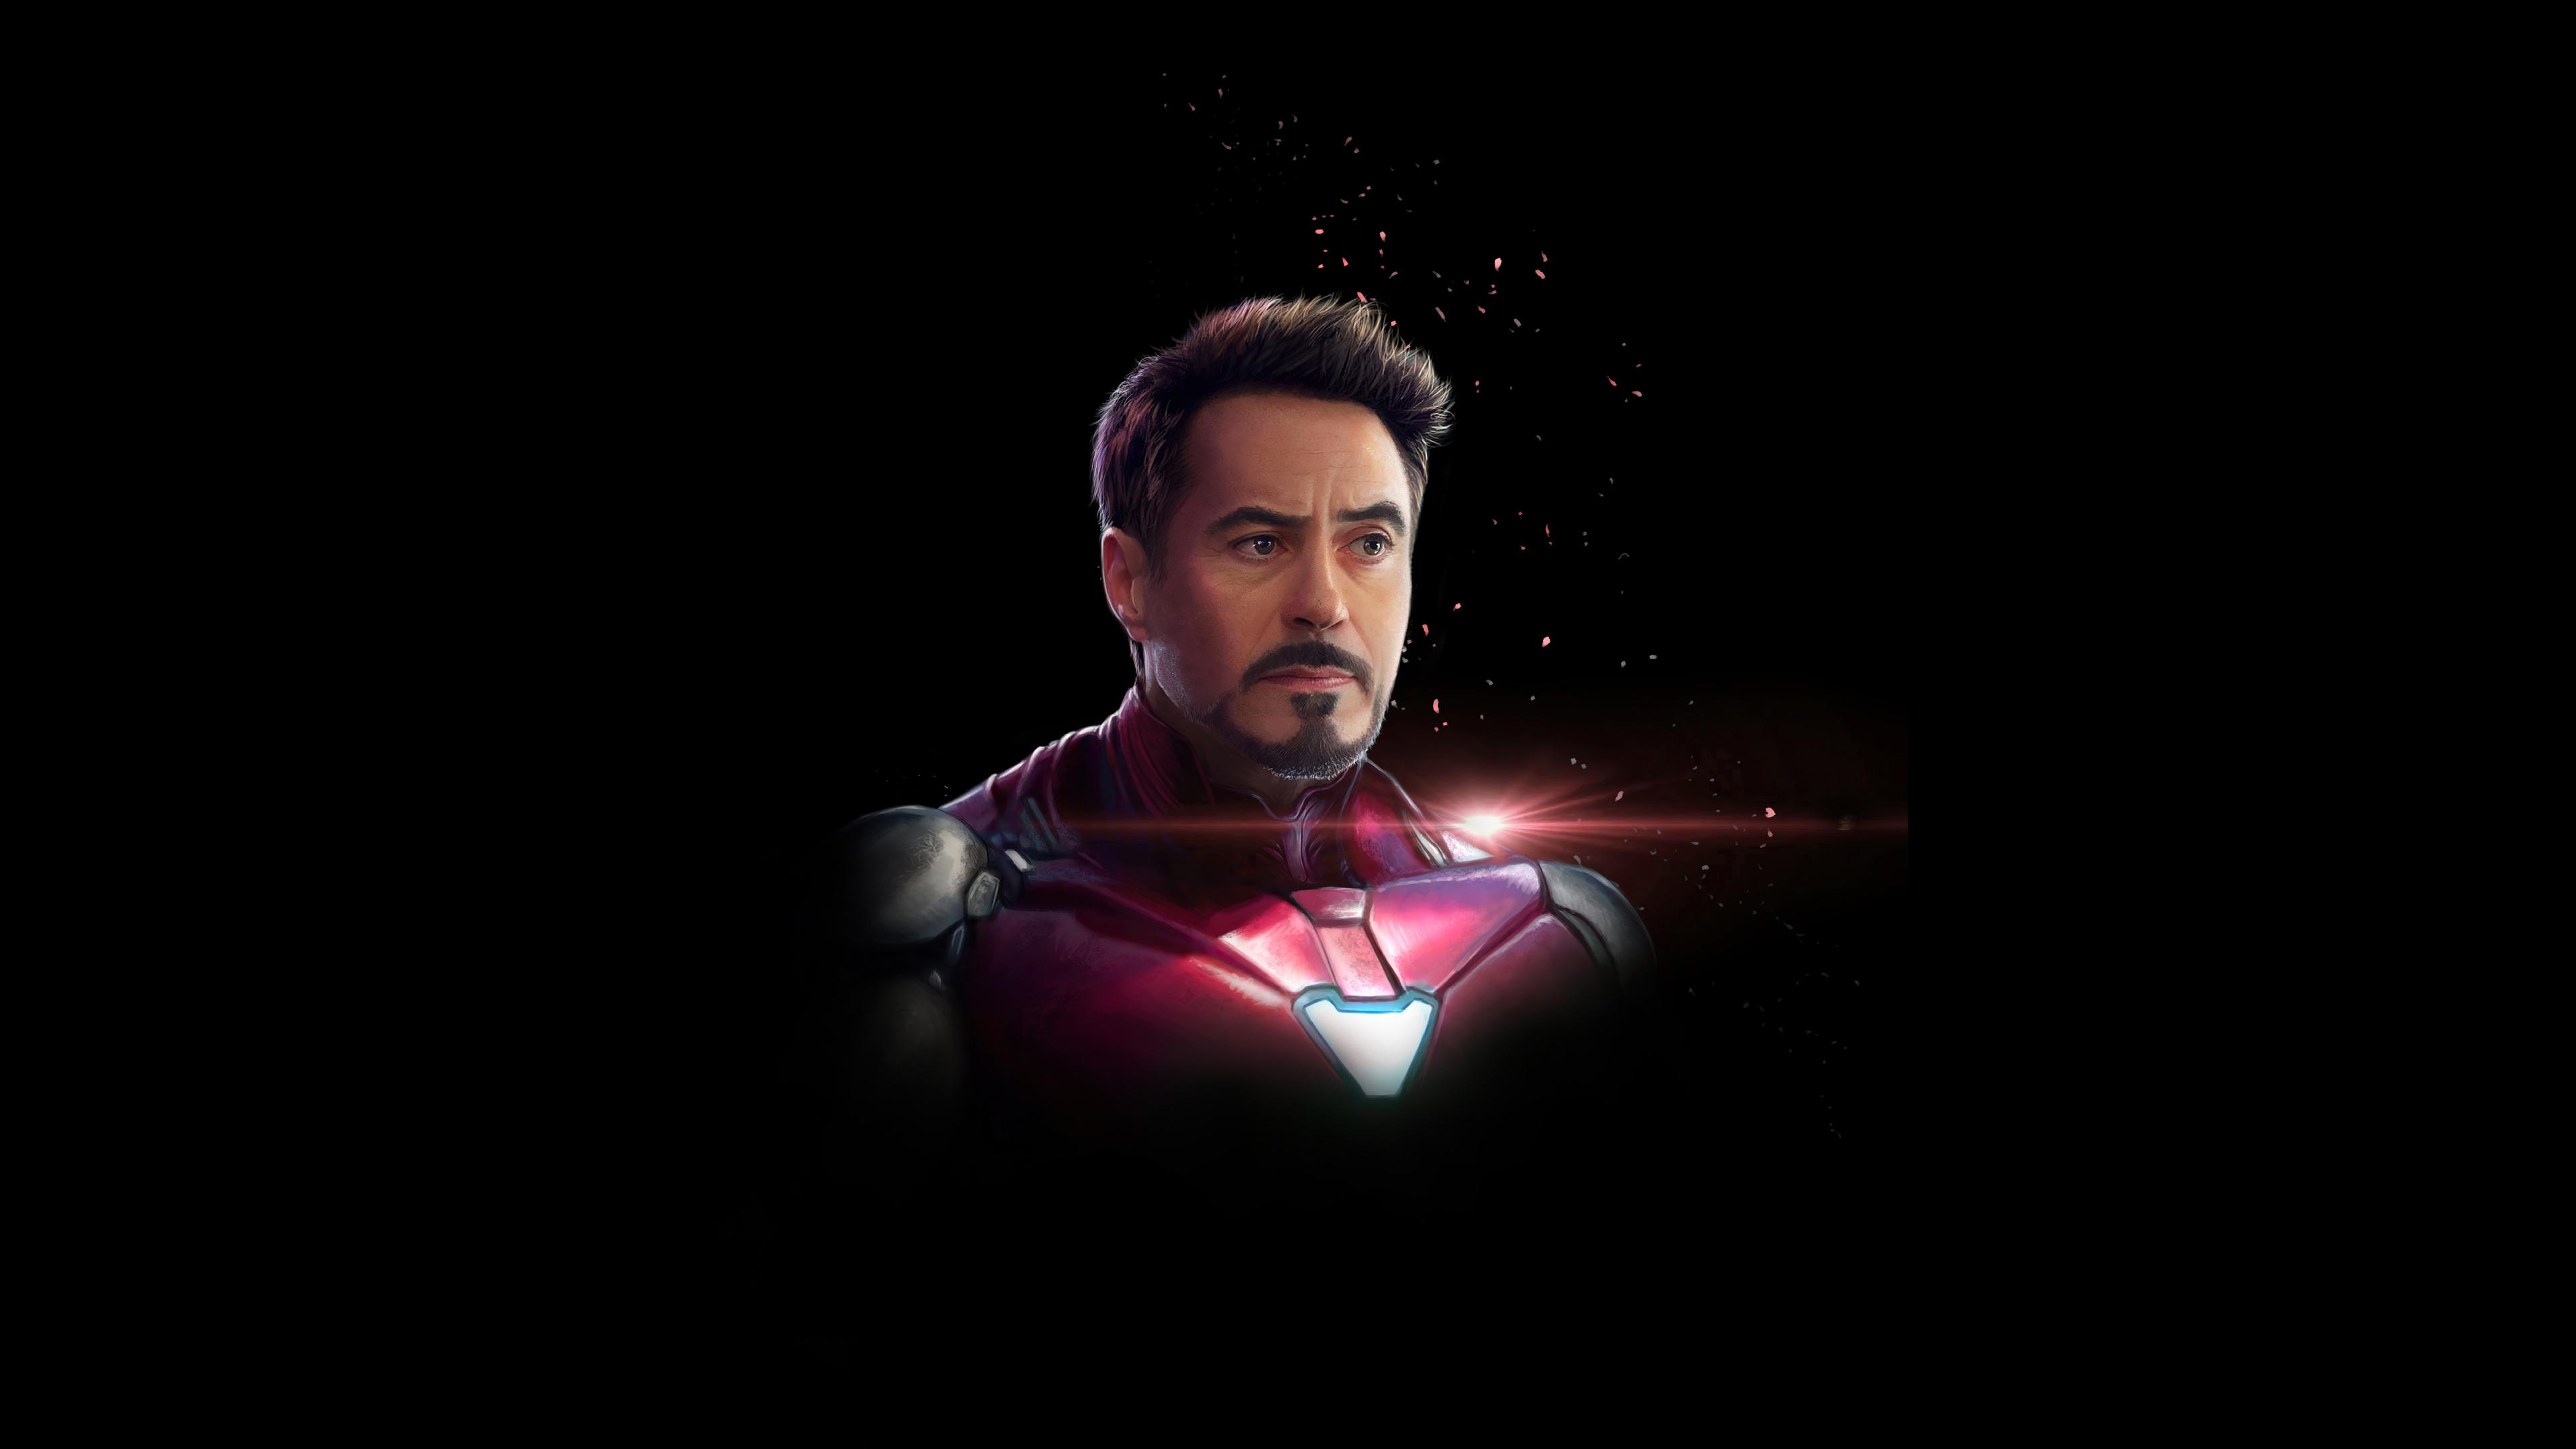 iron man dark minimal 4k 1616957151 - Iron Man Dark Minimal 4k - Iron Man Dark Minimal 4k wallpapers